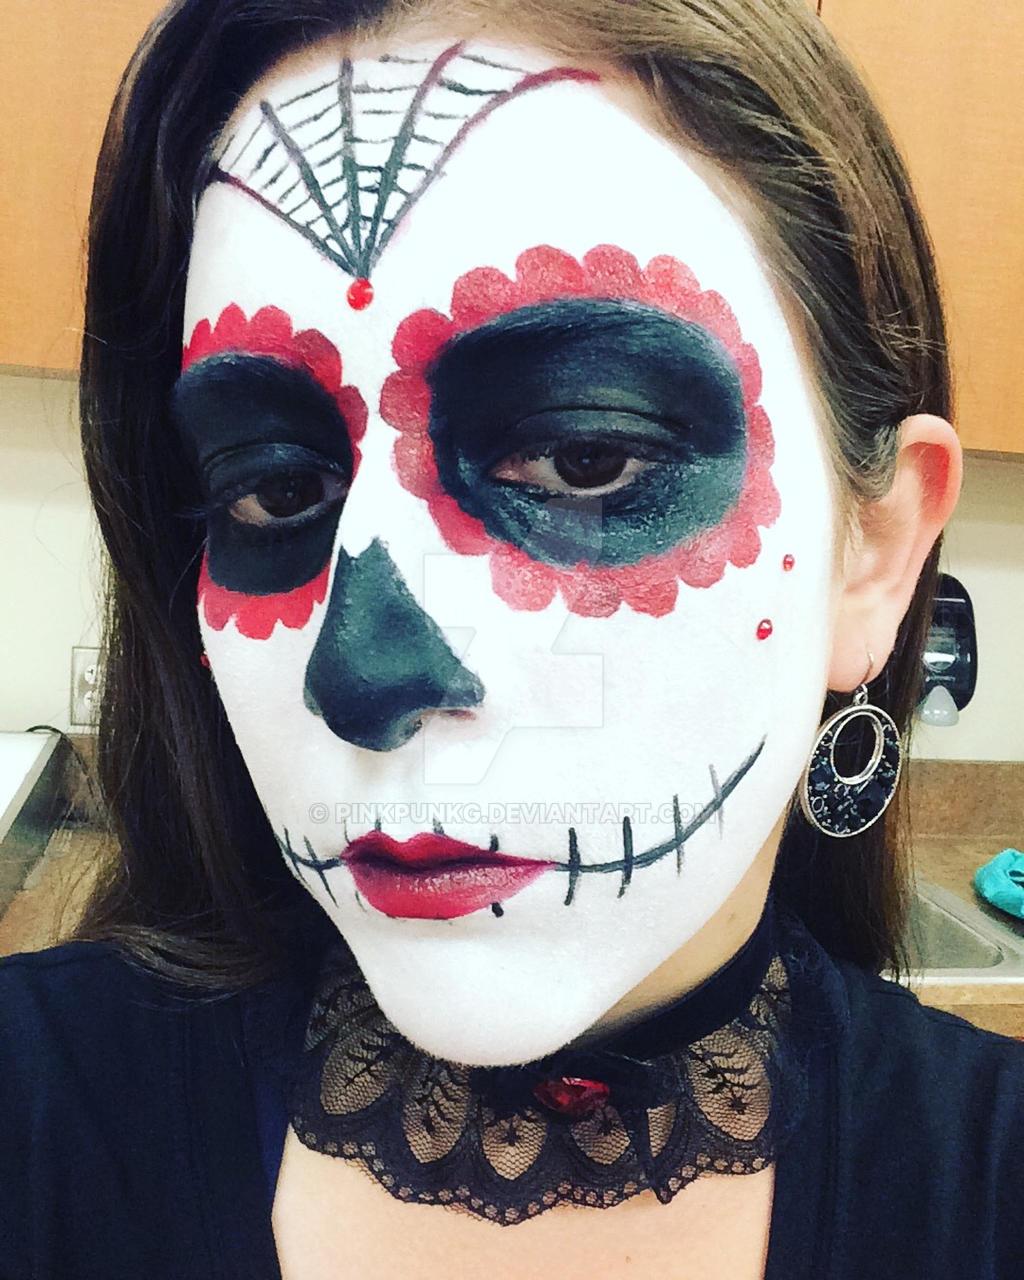 ... Dia de los muertos Makeup by PinkPunkG